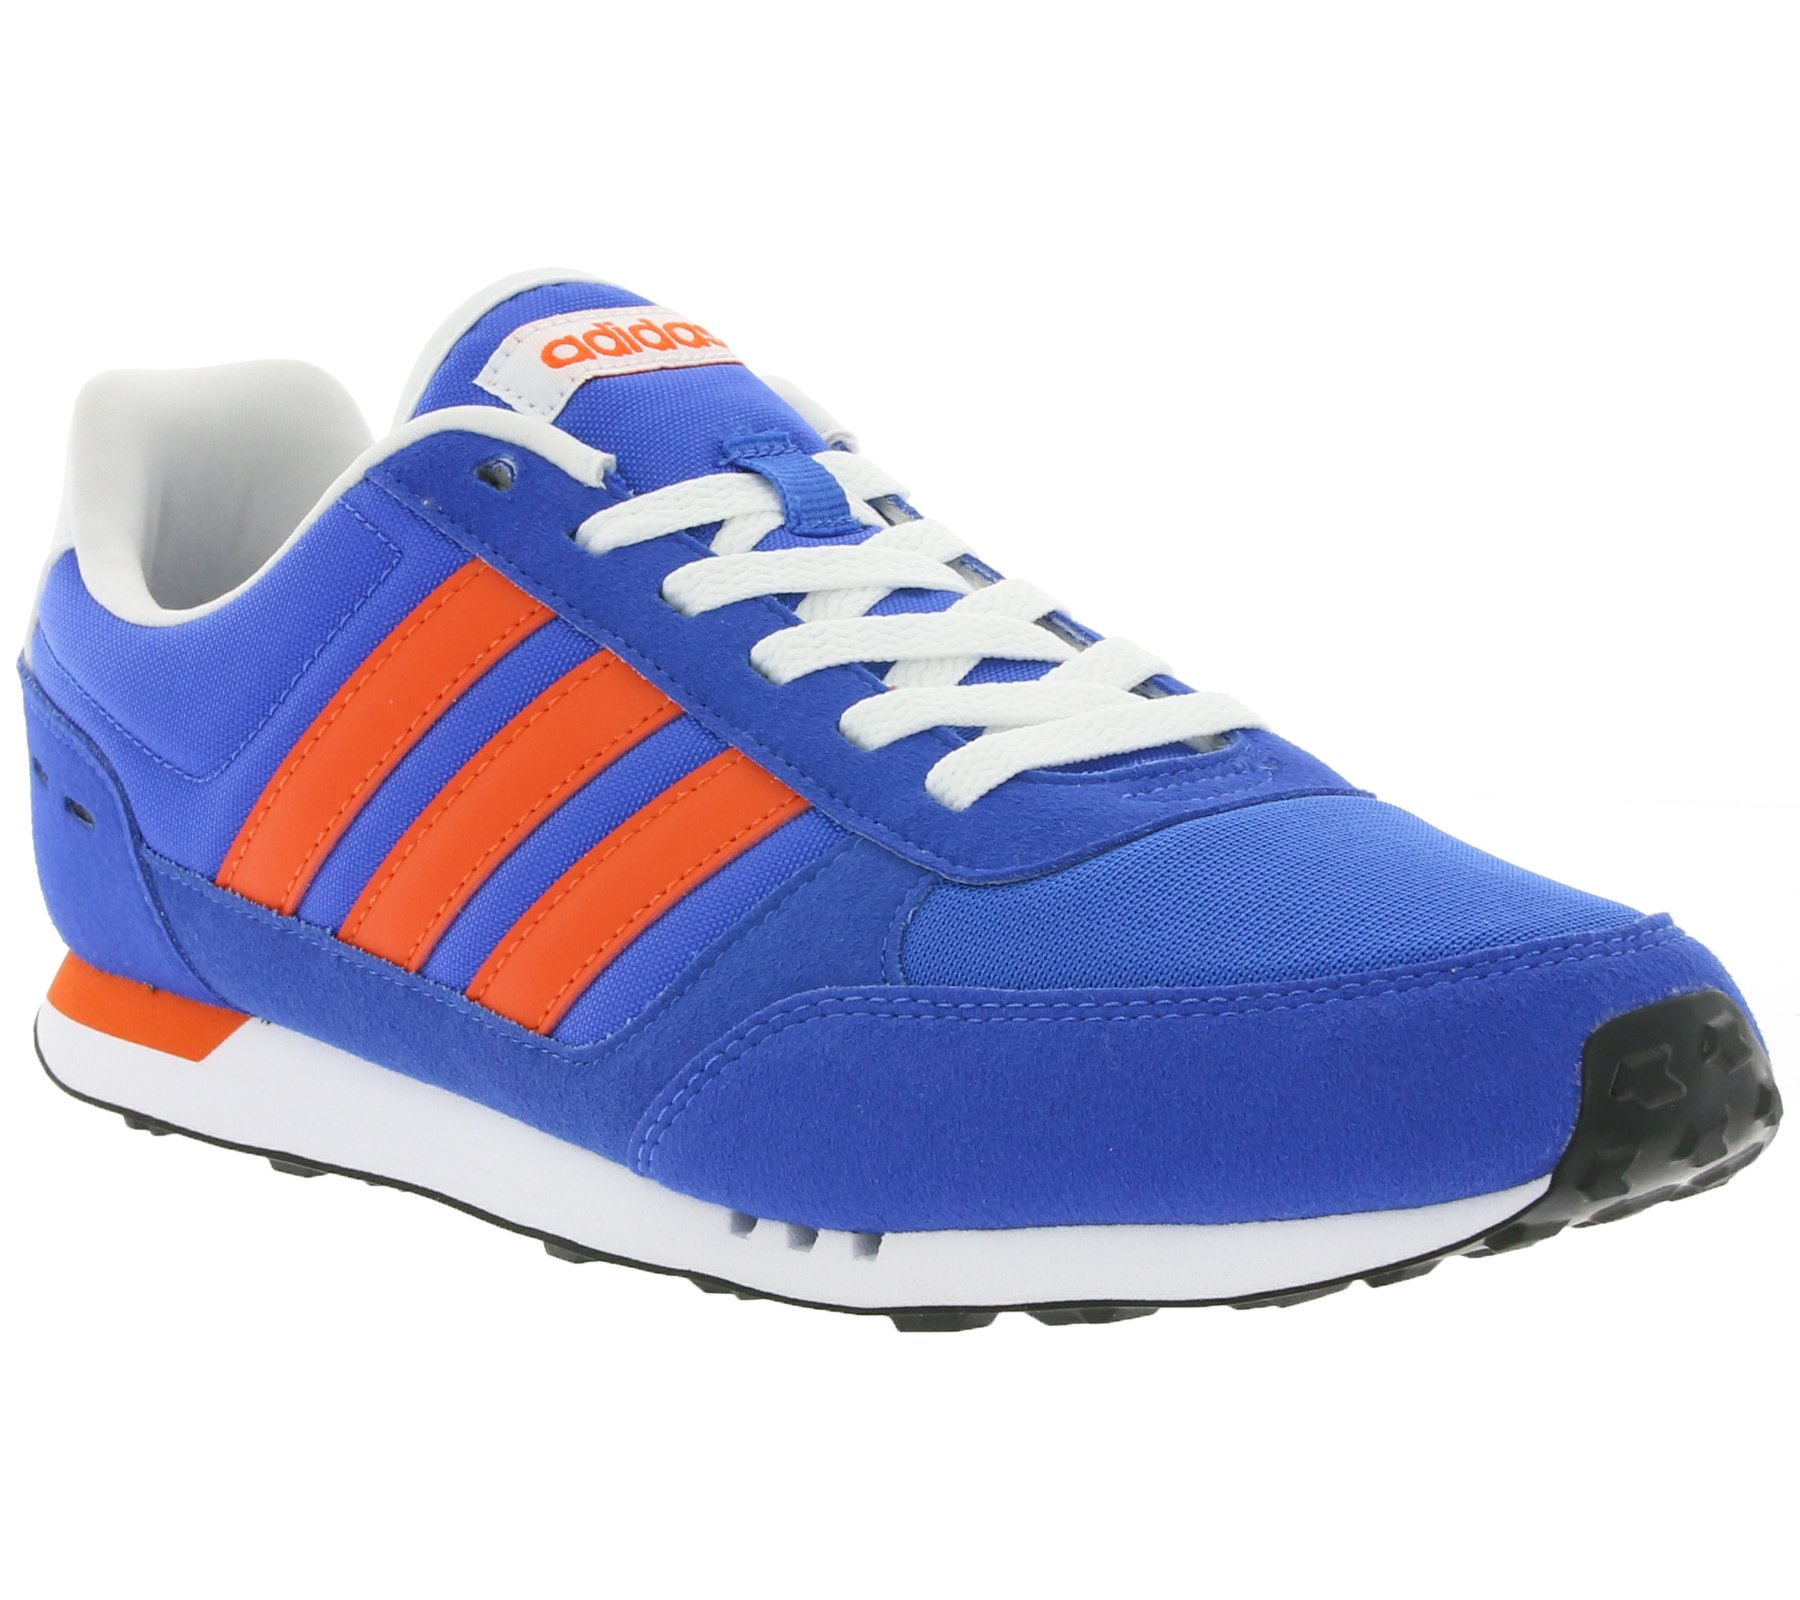 419791f327ea2 adidas Neo City Racer Men's Trainers Blue AW3875 | Amazon